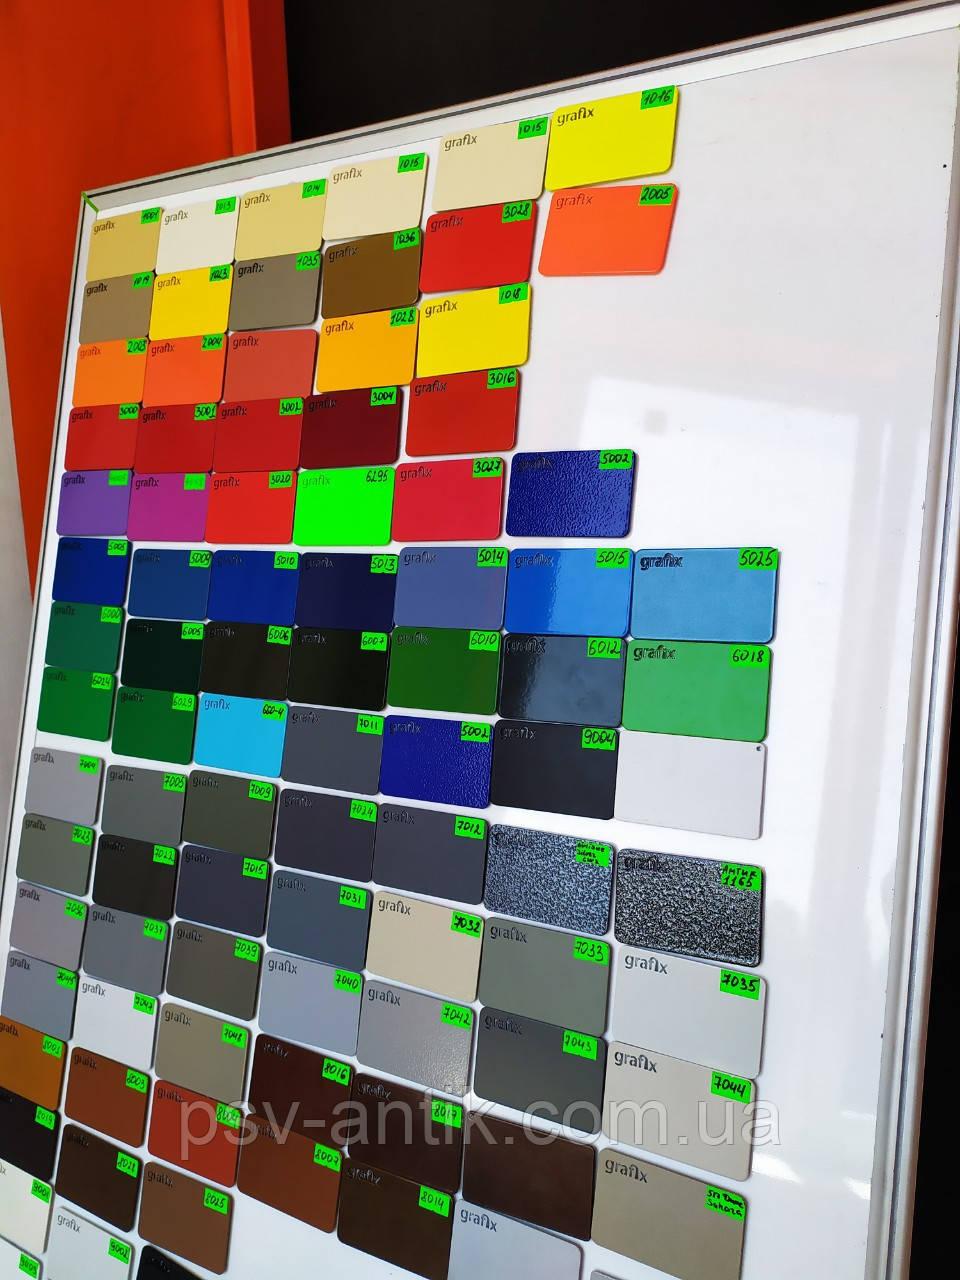 Порошковая краска глянцевая, полиэфирная, архитектурная, 1003